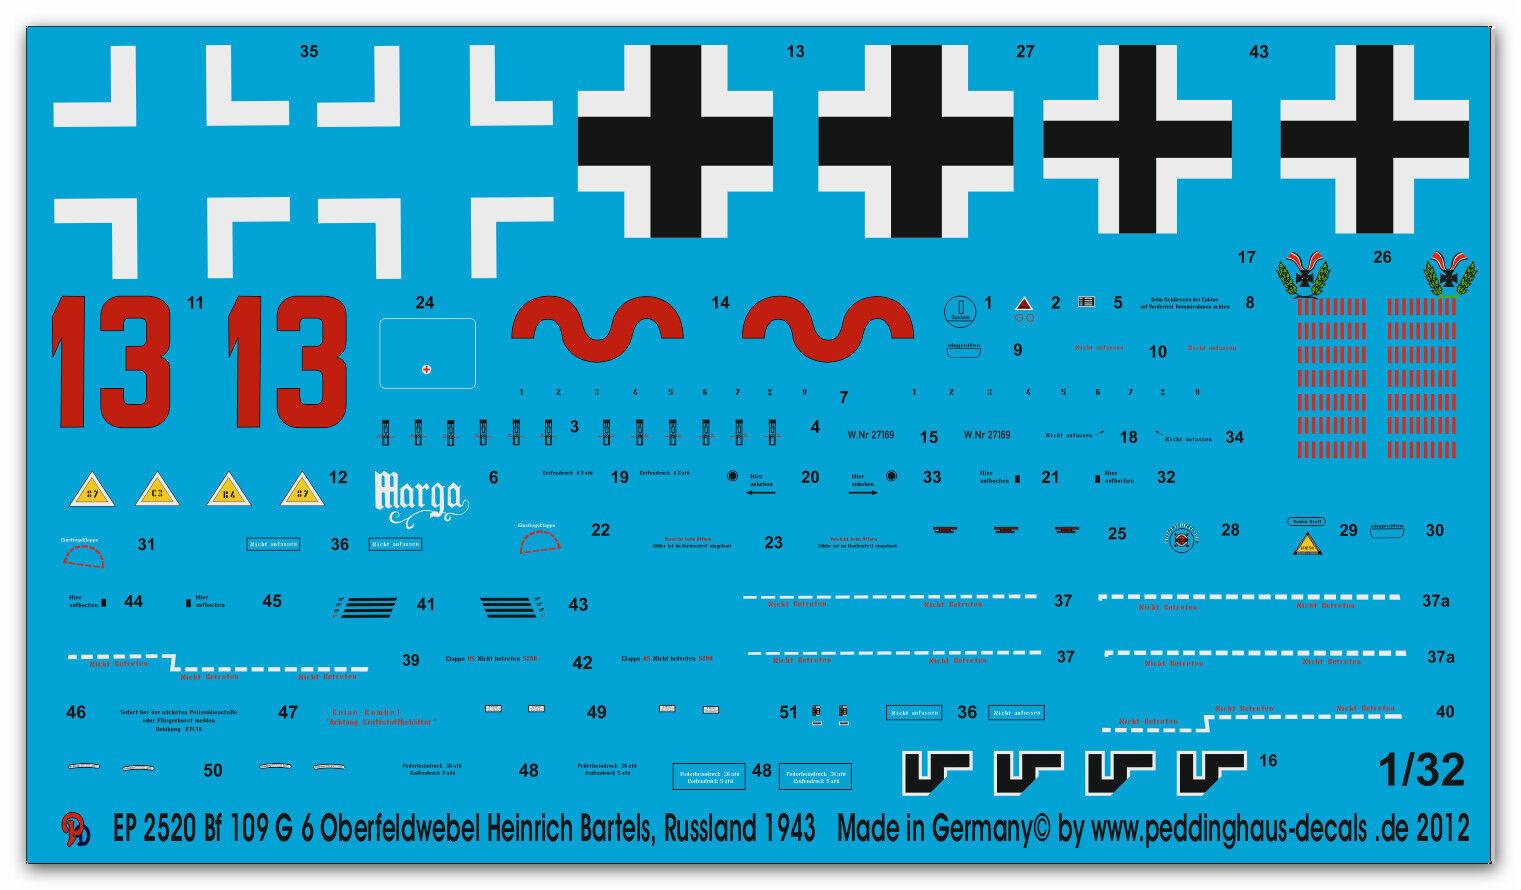 Peddinghaus 2520 1 1 1 32 Bf 109G 6 Ssilver Heinrich Bartels, RUSIA 1943 42675a